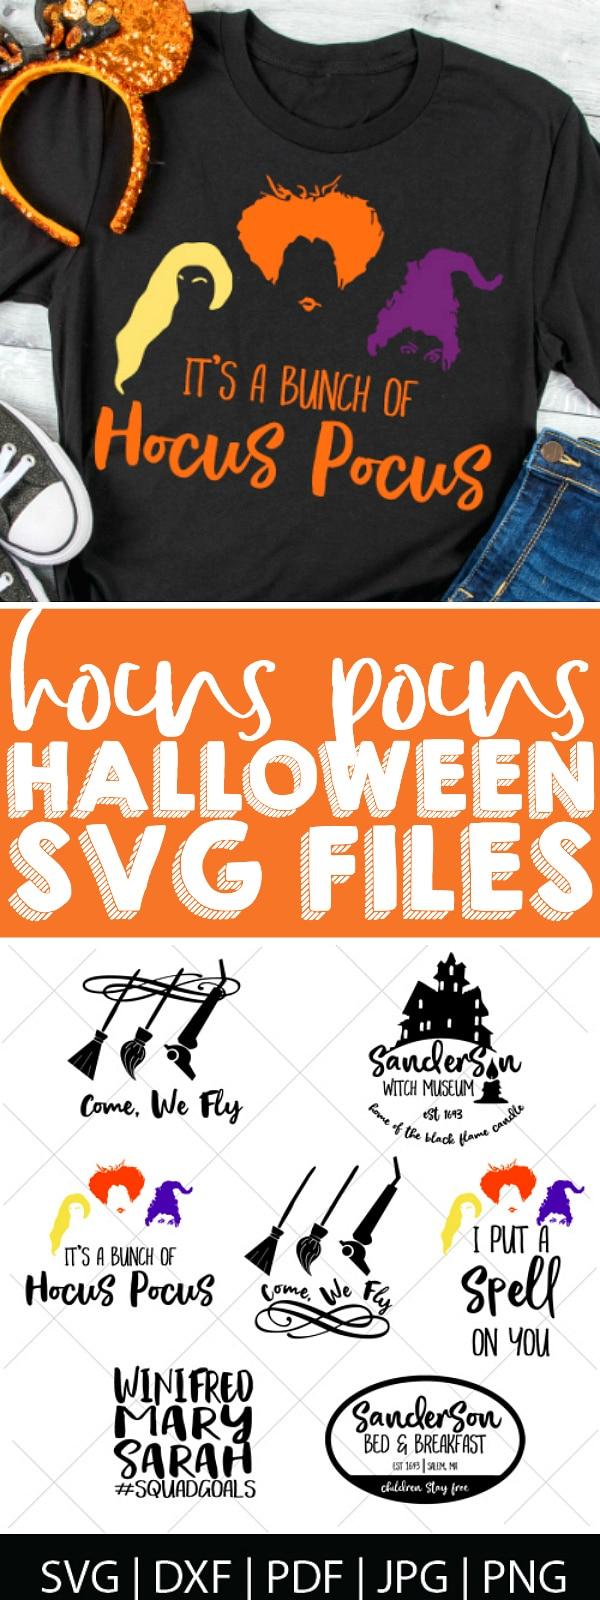 Hocus Pocus Svg : hocus, pocus, Hocus, Pocus, Files, Nerds